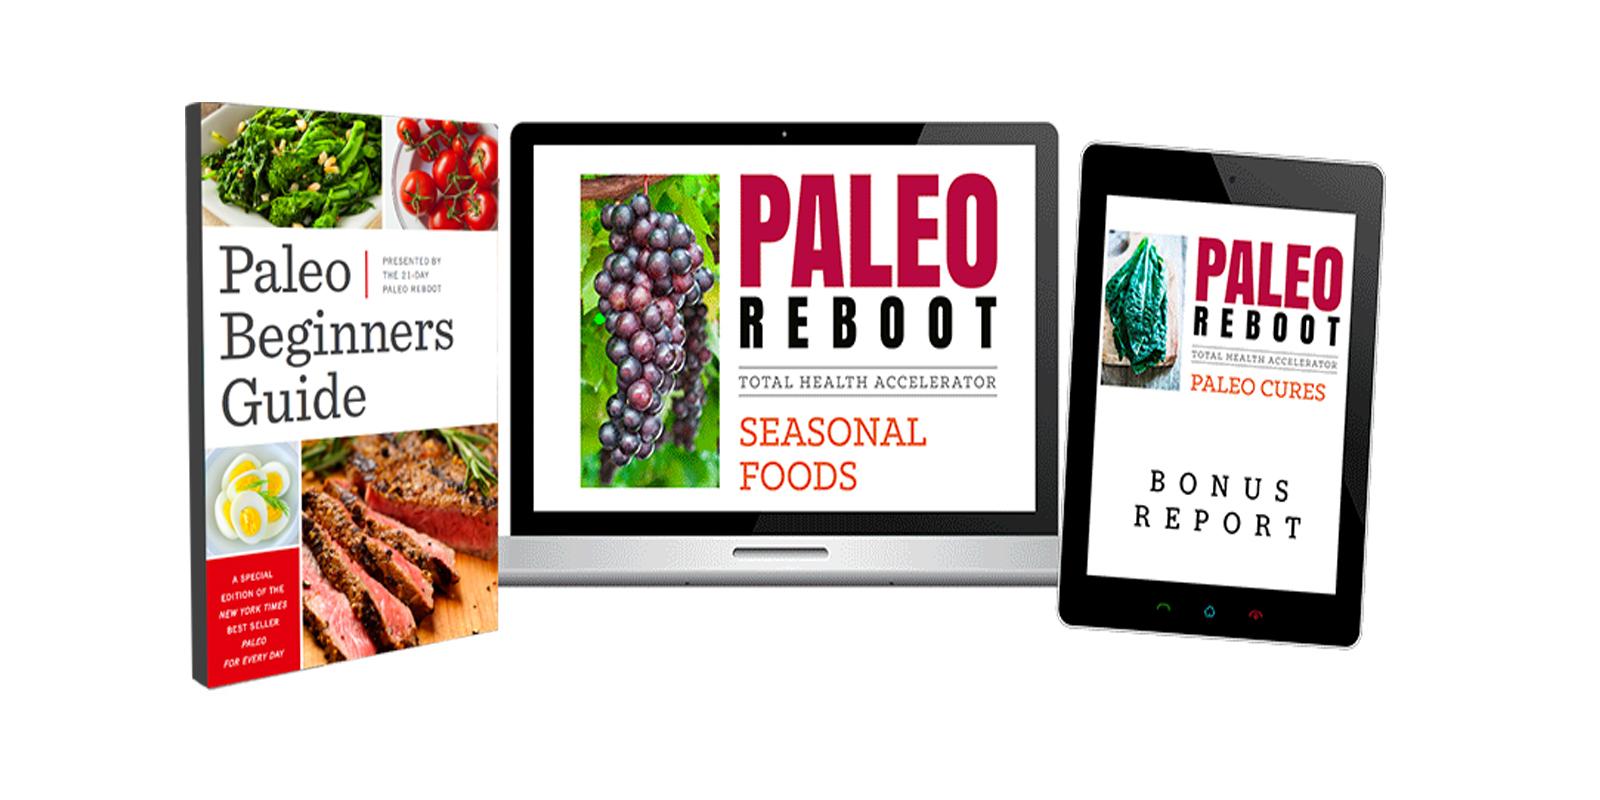 Paleo Reboot review